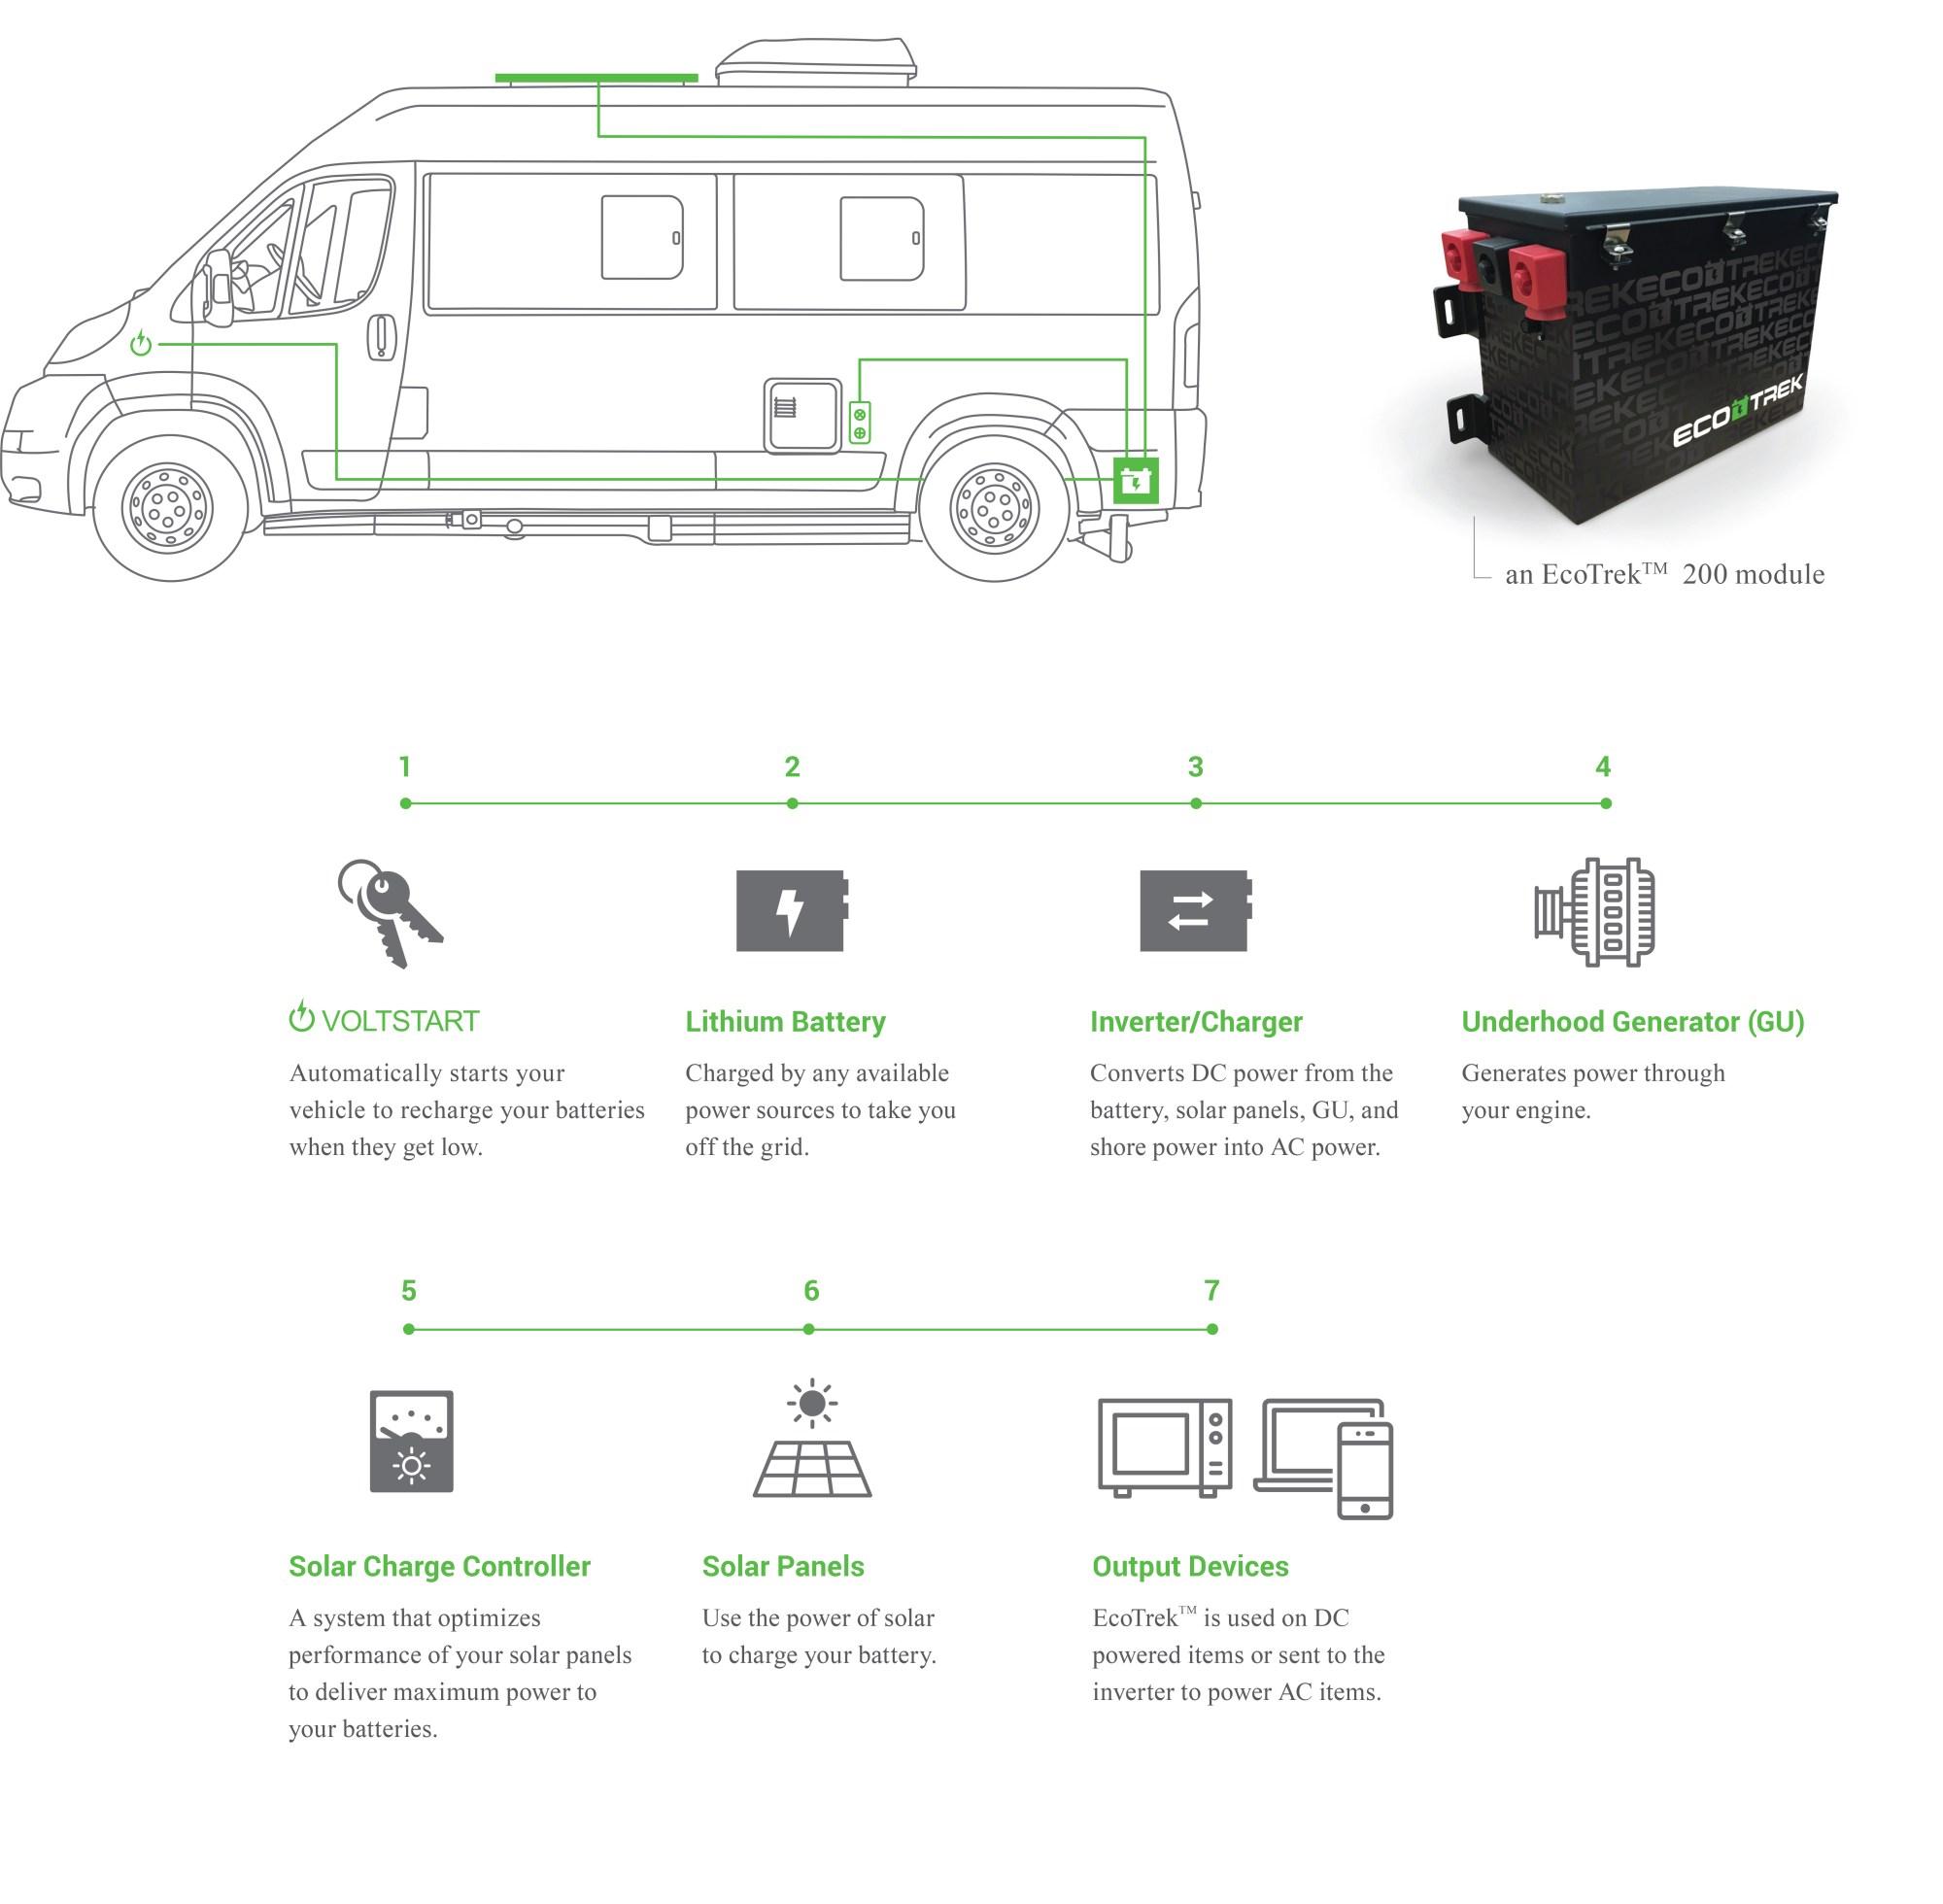 hight resolution of hymer caravan wiring diagram wiring library ecotrek infographic ecotrek roadtrek ecotrek infographic hymer caravan wiring